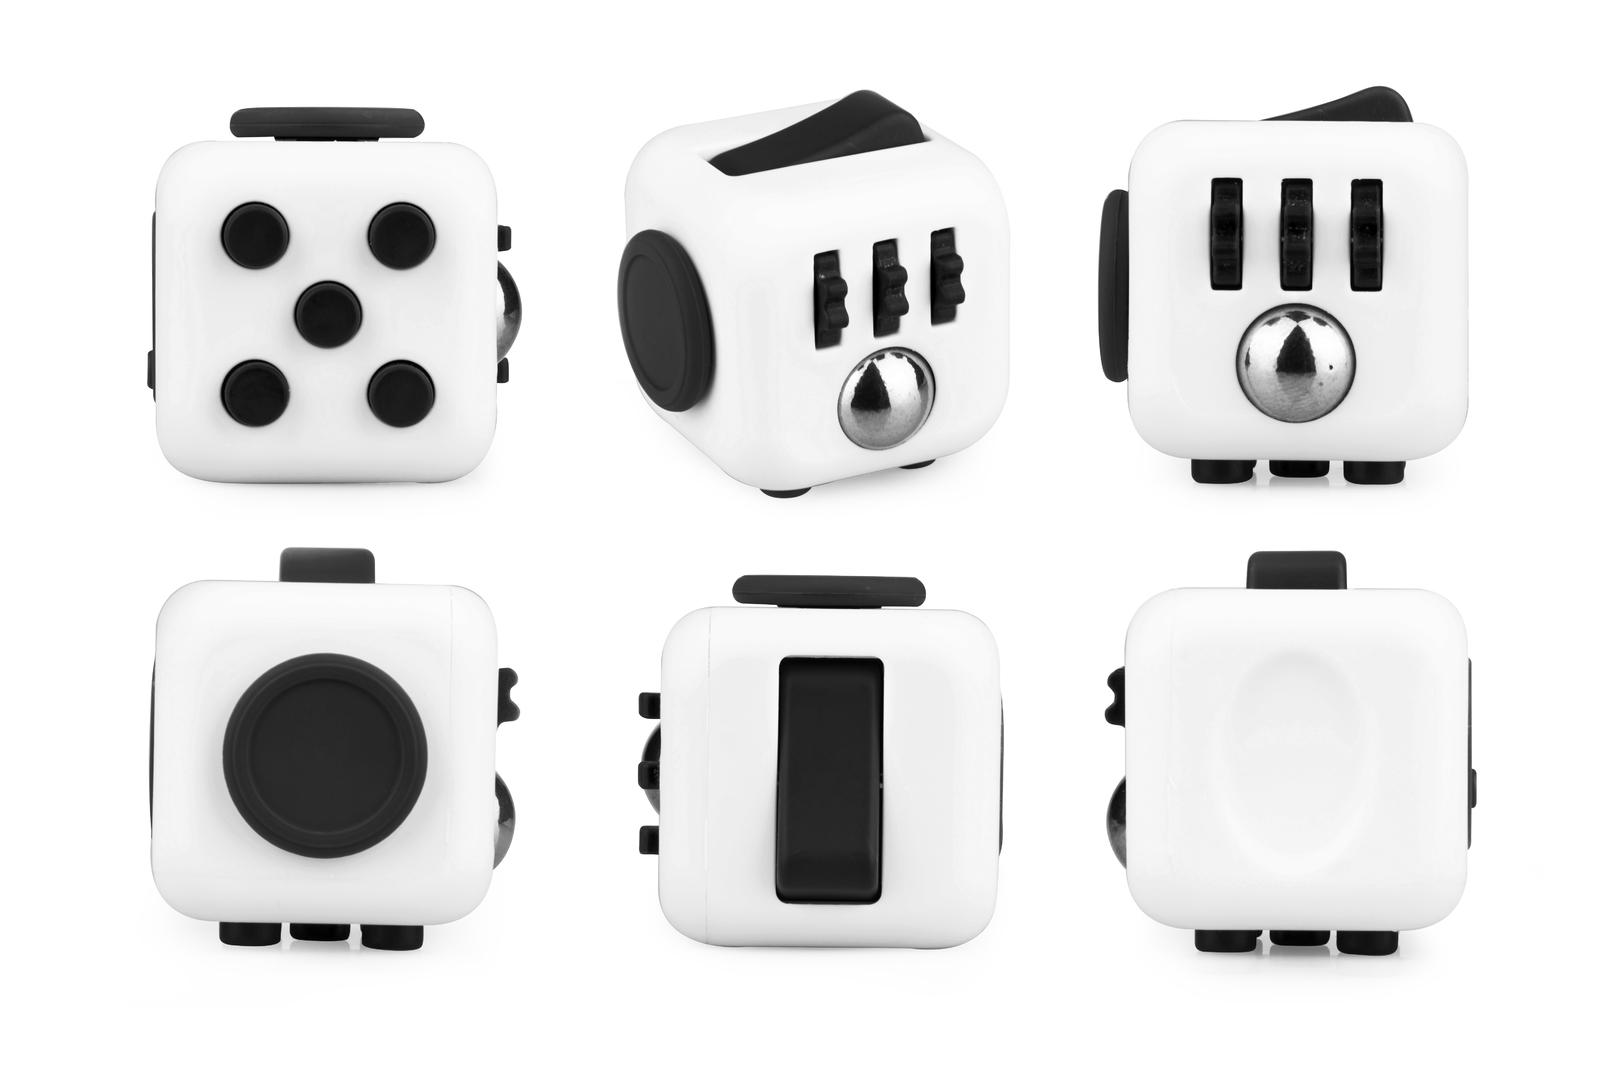 Antsy Labs Fidget Cube (Series 1, Dice) image